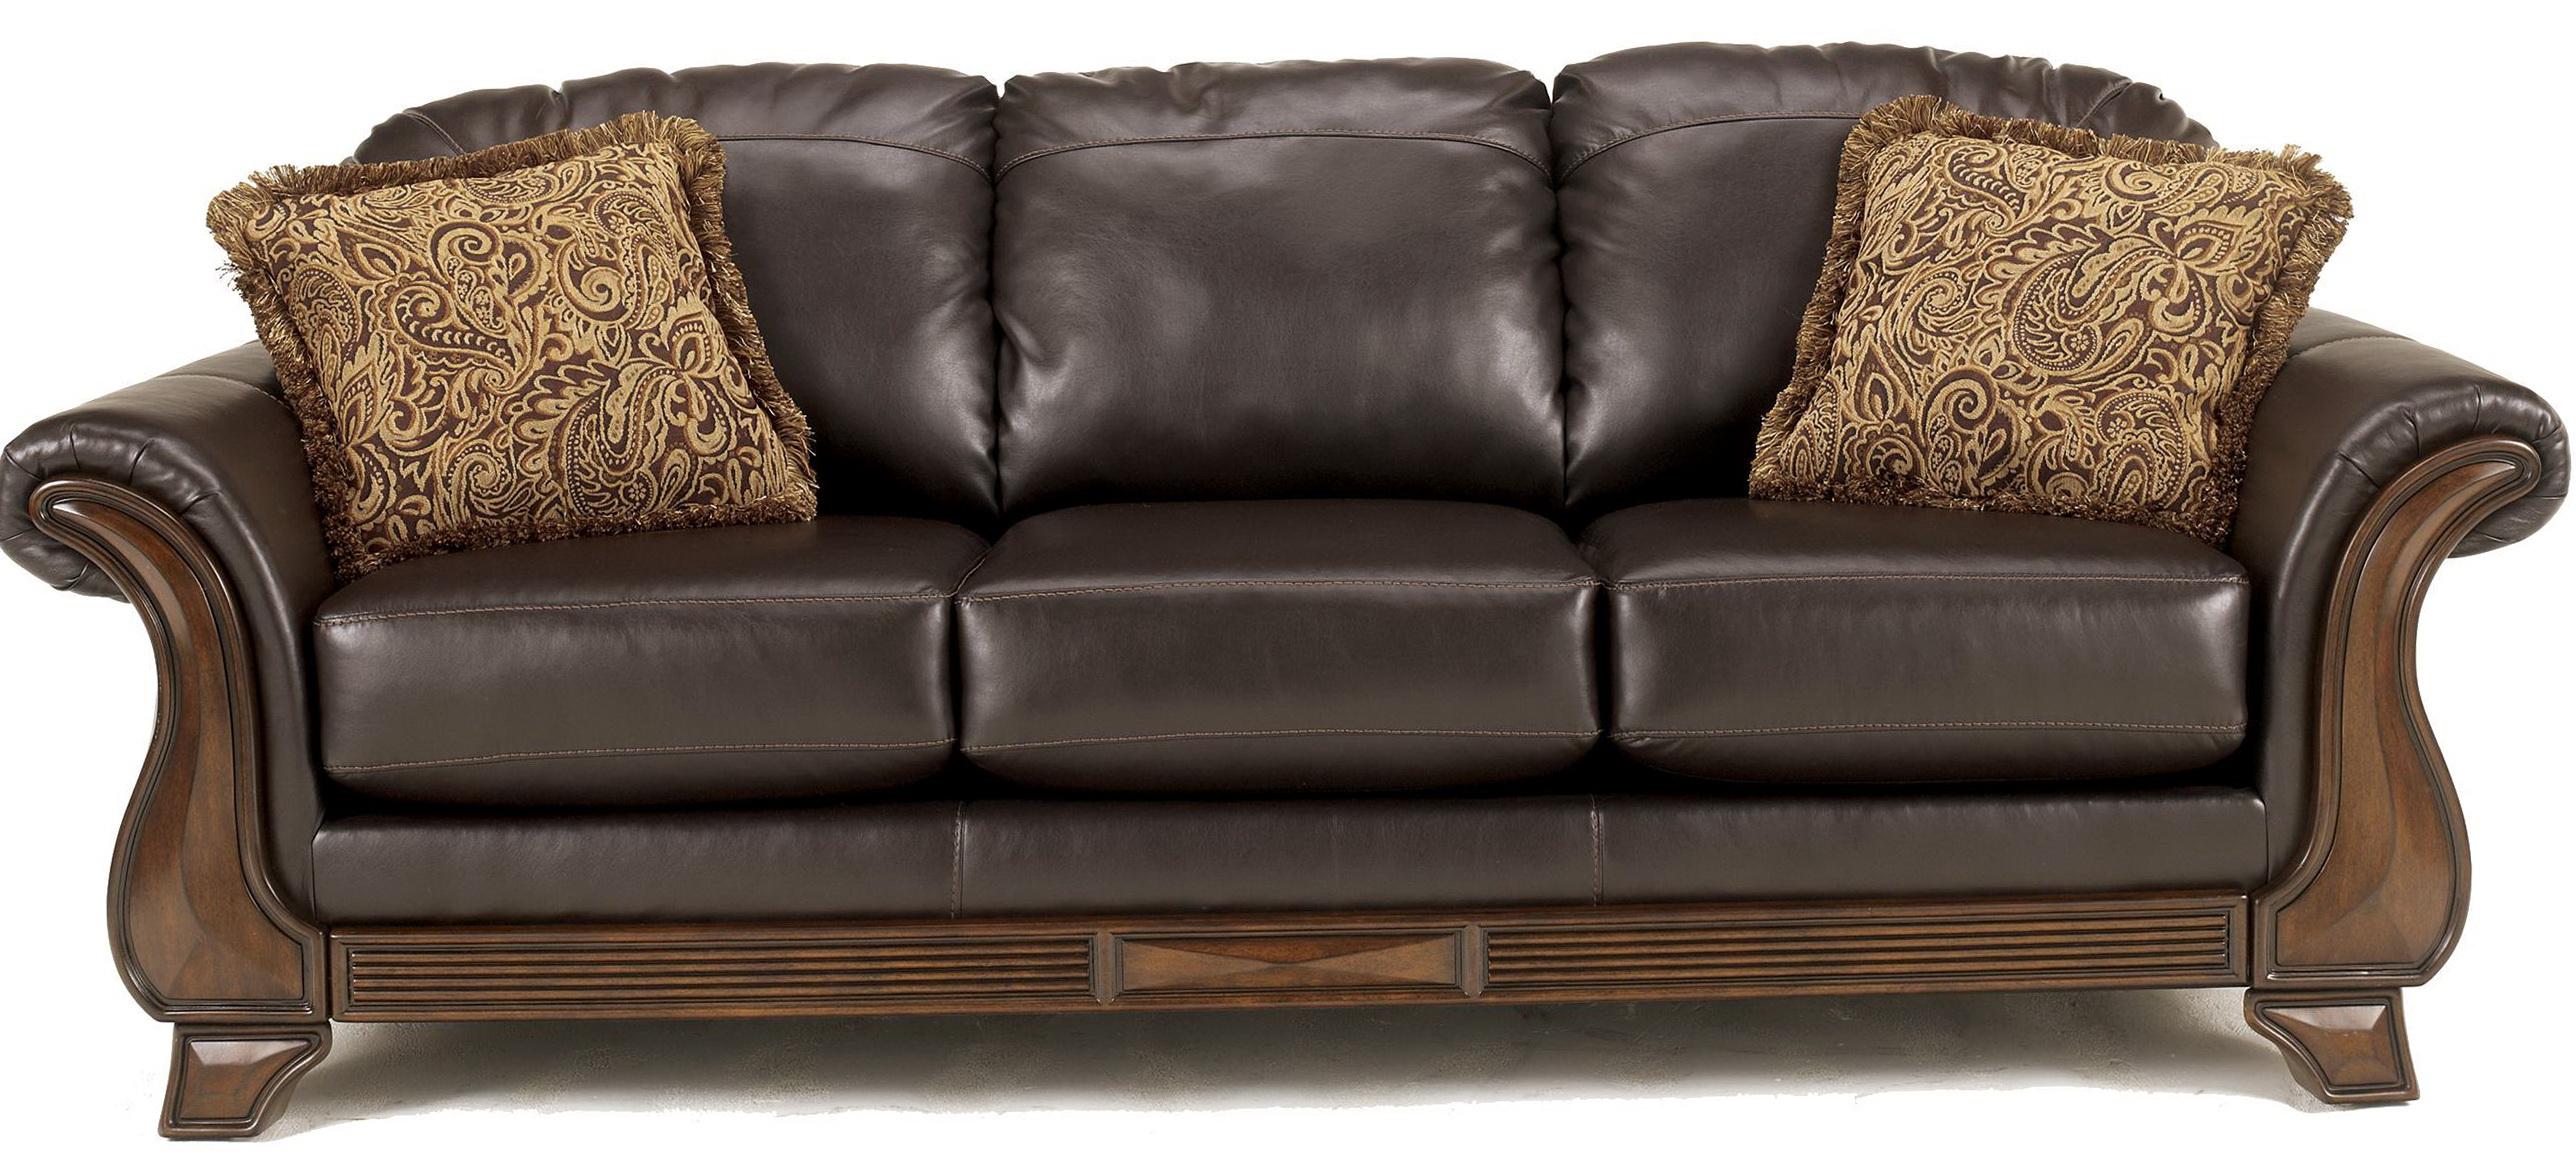 Leather Sleeper Sofa Queen Sofa 8035 Home Design Ideas